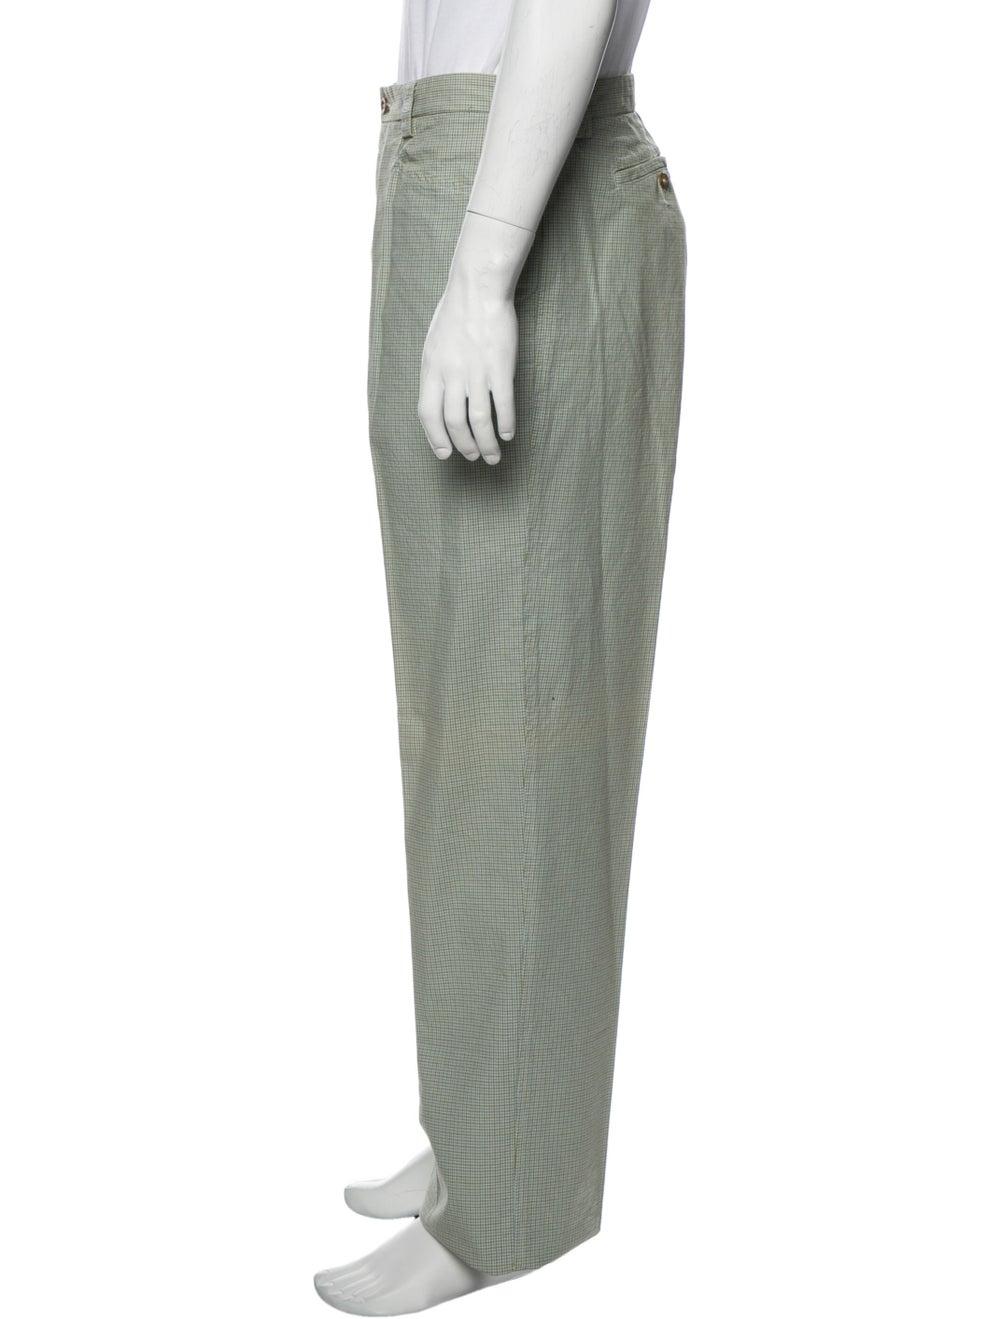 Etro Plaid Print Pants Green - image 2